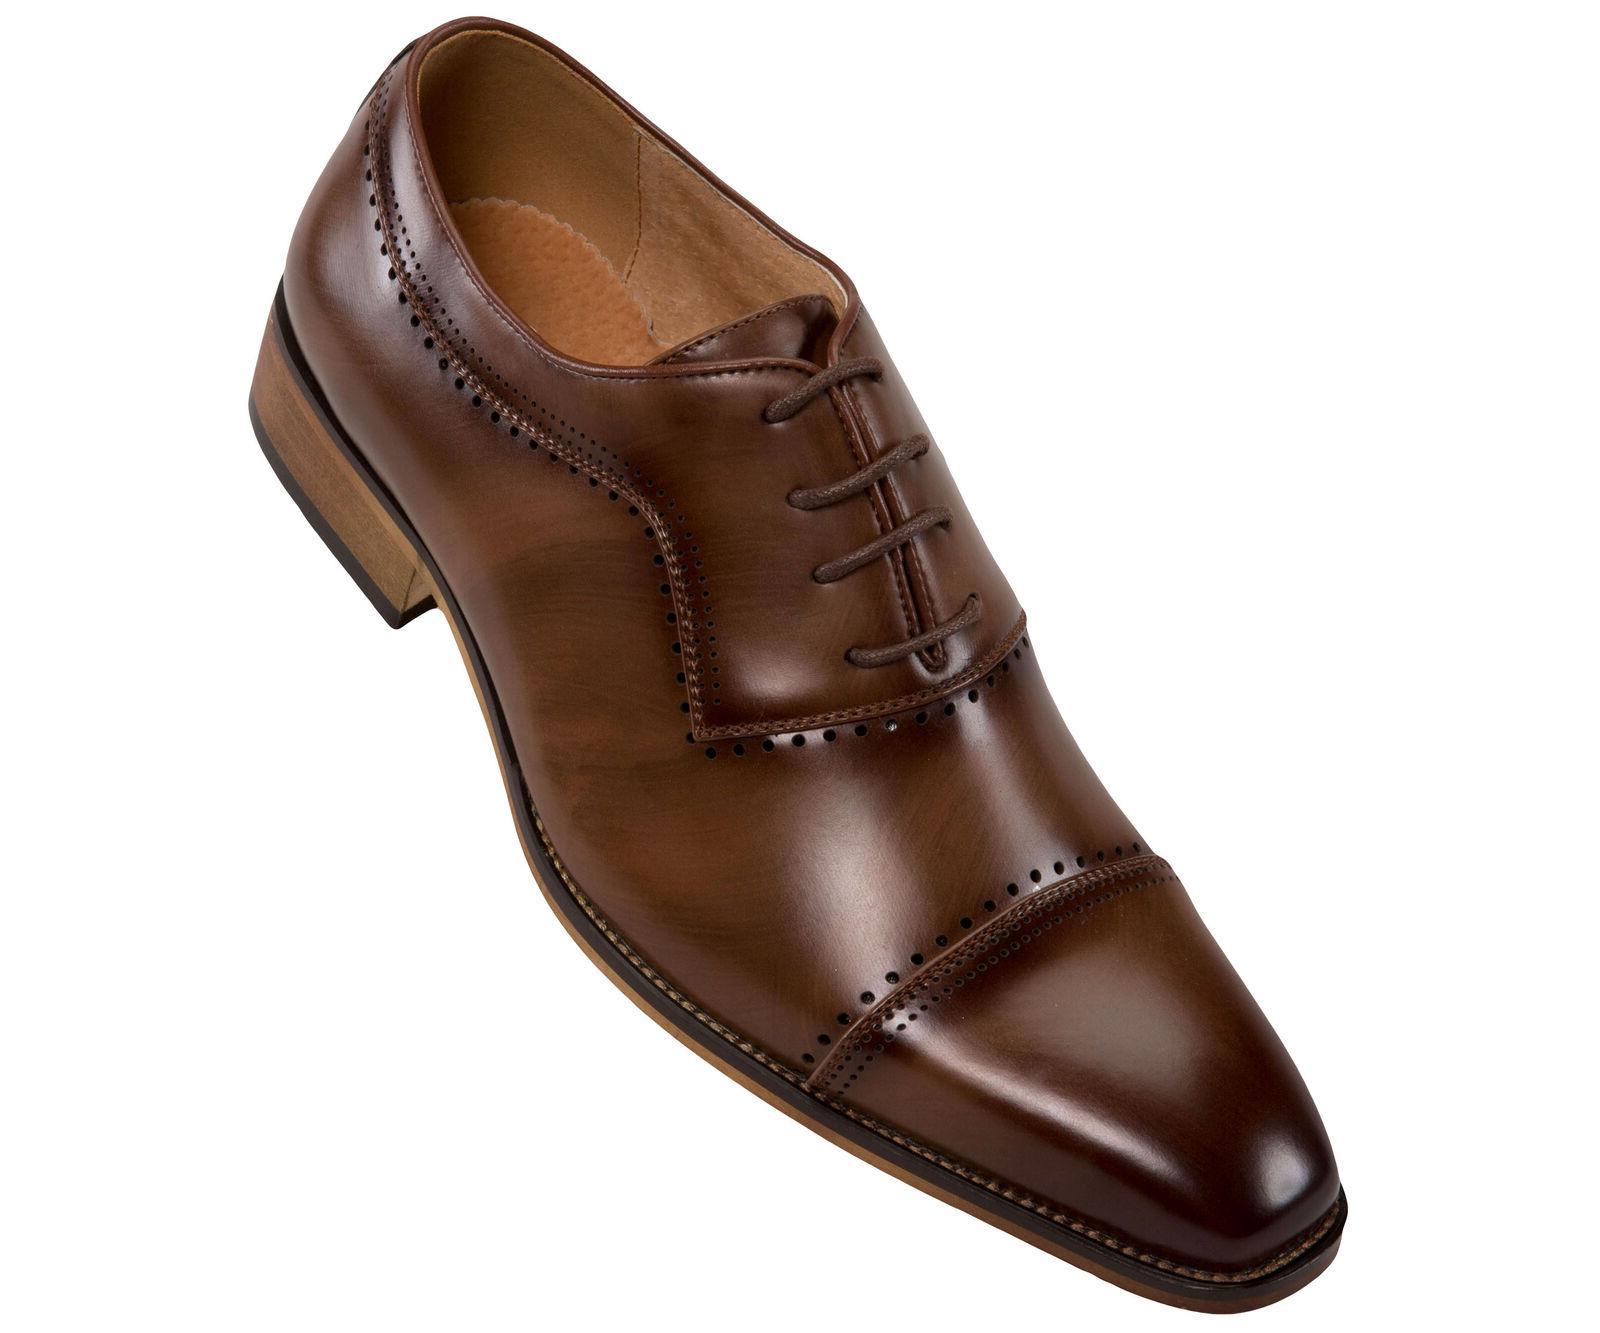 Mens Dress Oxford Shoes - Up Shoes